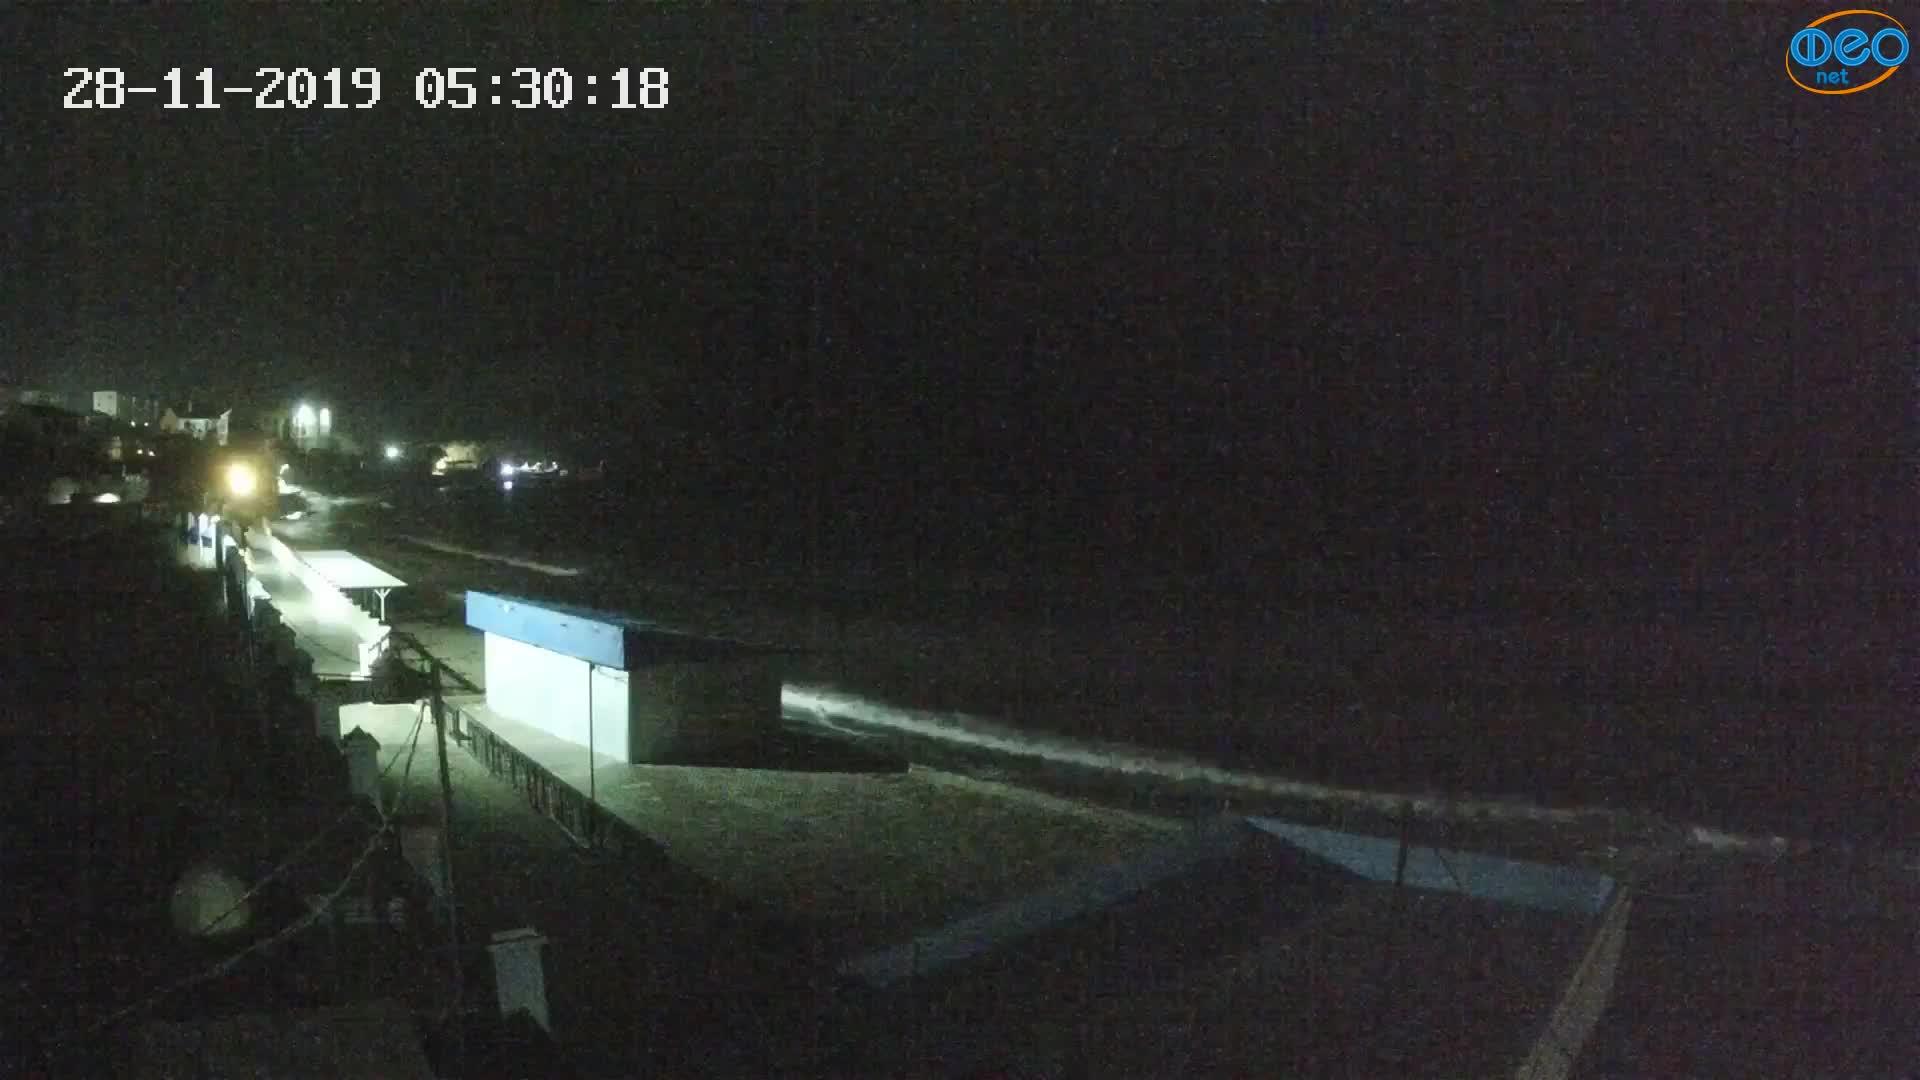 Веб-камеры Феодосии, Орджоникидзе - набережная - вид на Васюковку, 2019-11-28 05:30:41